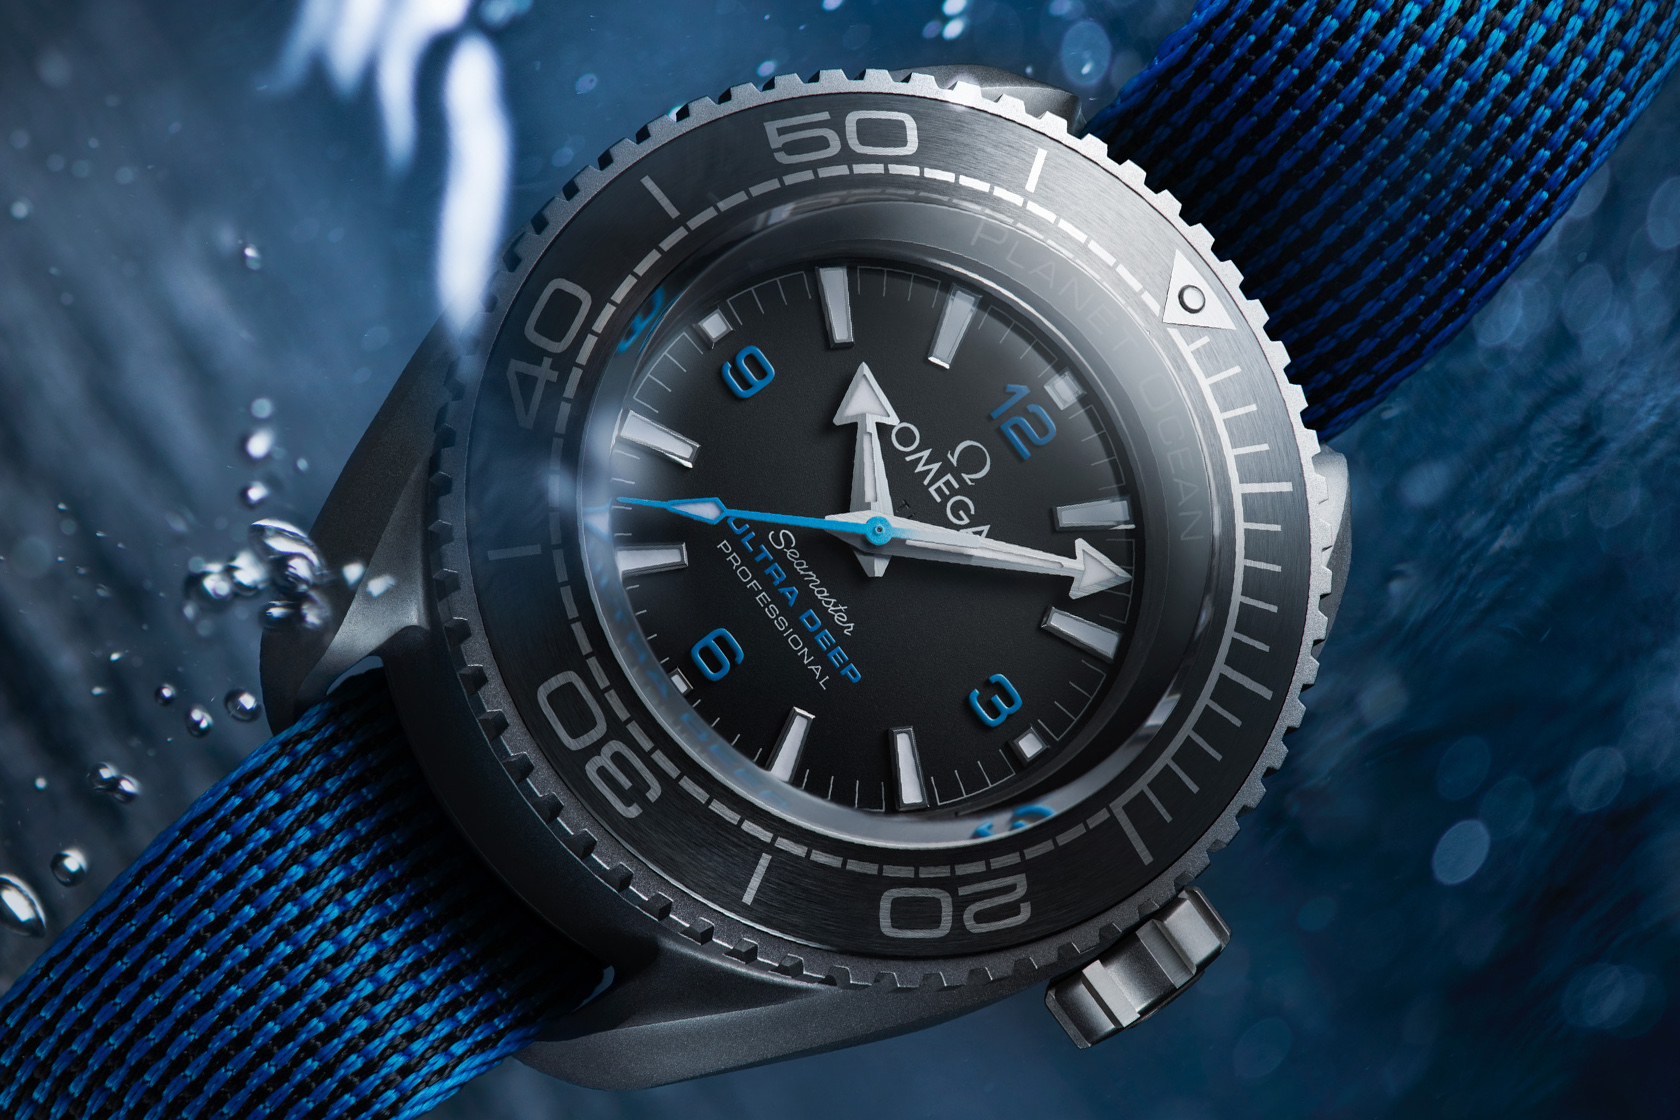 WATCH THIS|深海下的無限挑戰,潛水錶的極致科學